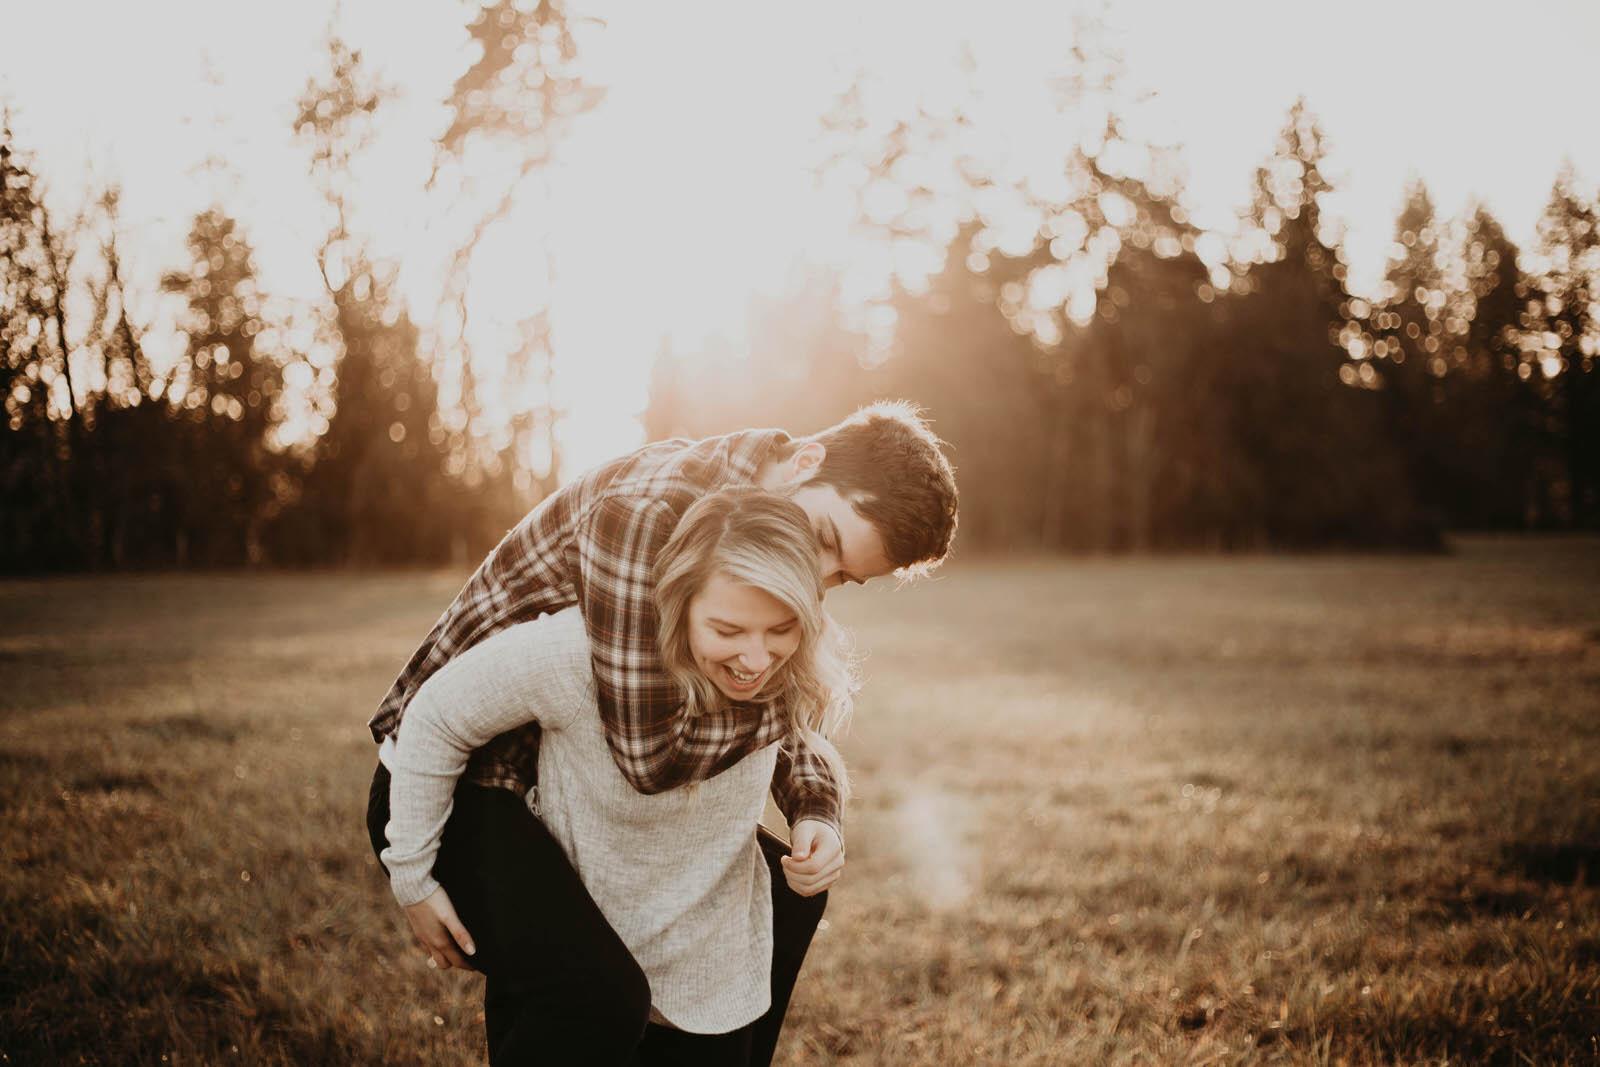 kayla-tallon-jamiecarle-couples-session-portland-9730.jpg